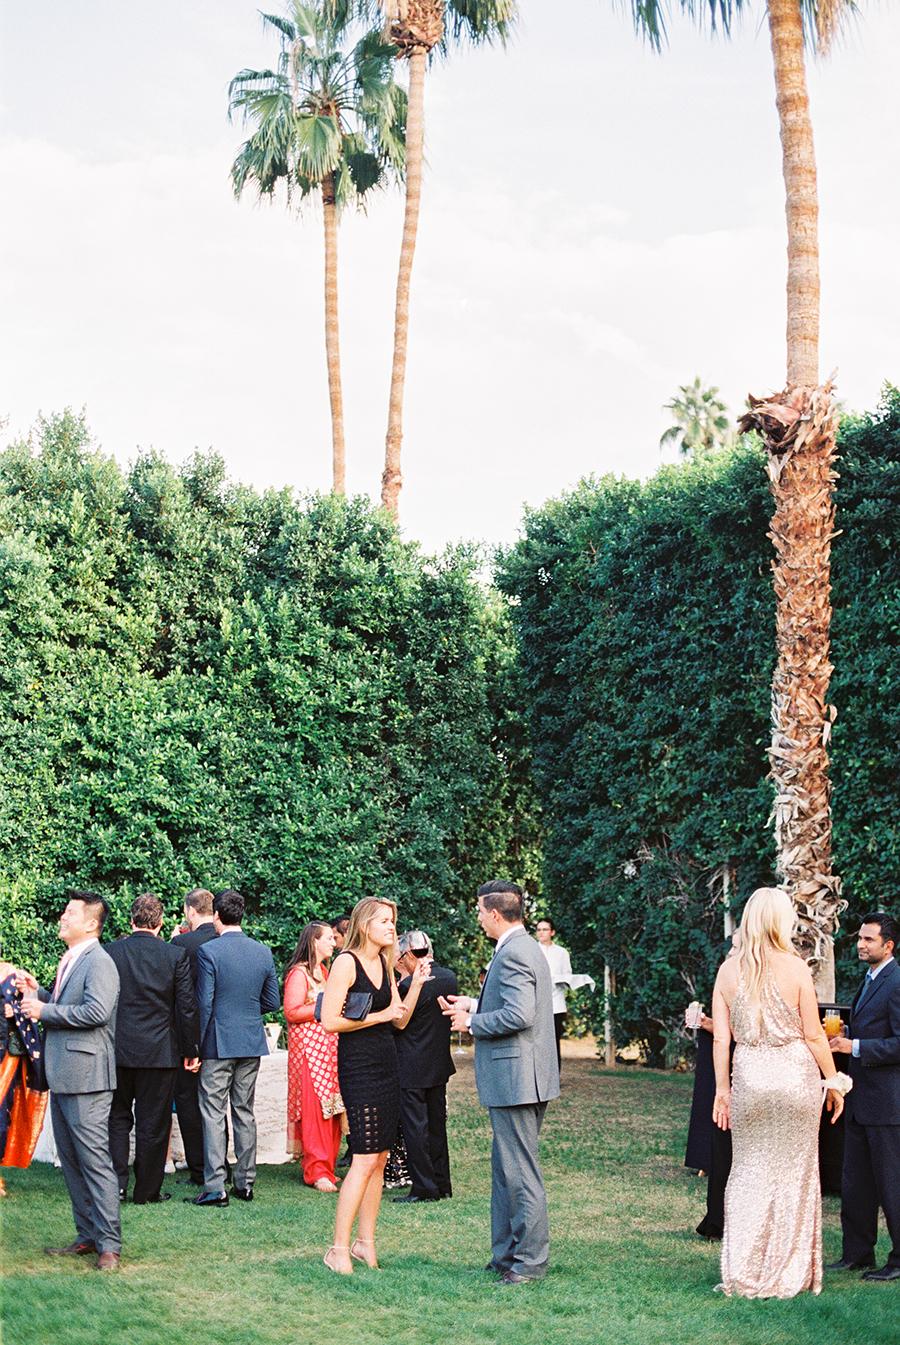 PARKER_PALMSPRING_WEDDING_SALLY_PINERA_PHOTOGRAPHY-629.jpg